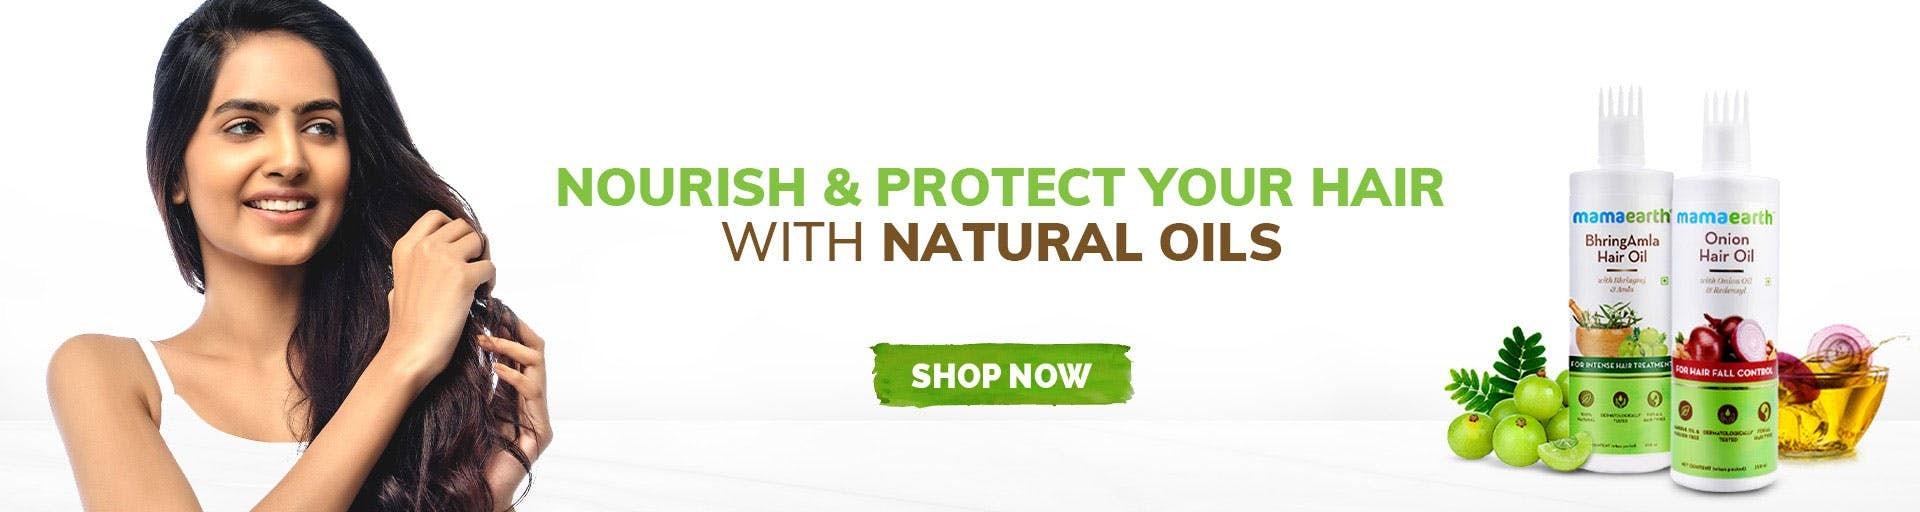 mamaearth.in - Mamaearth Hair Oils starting at just ₹299